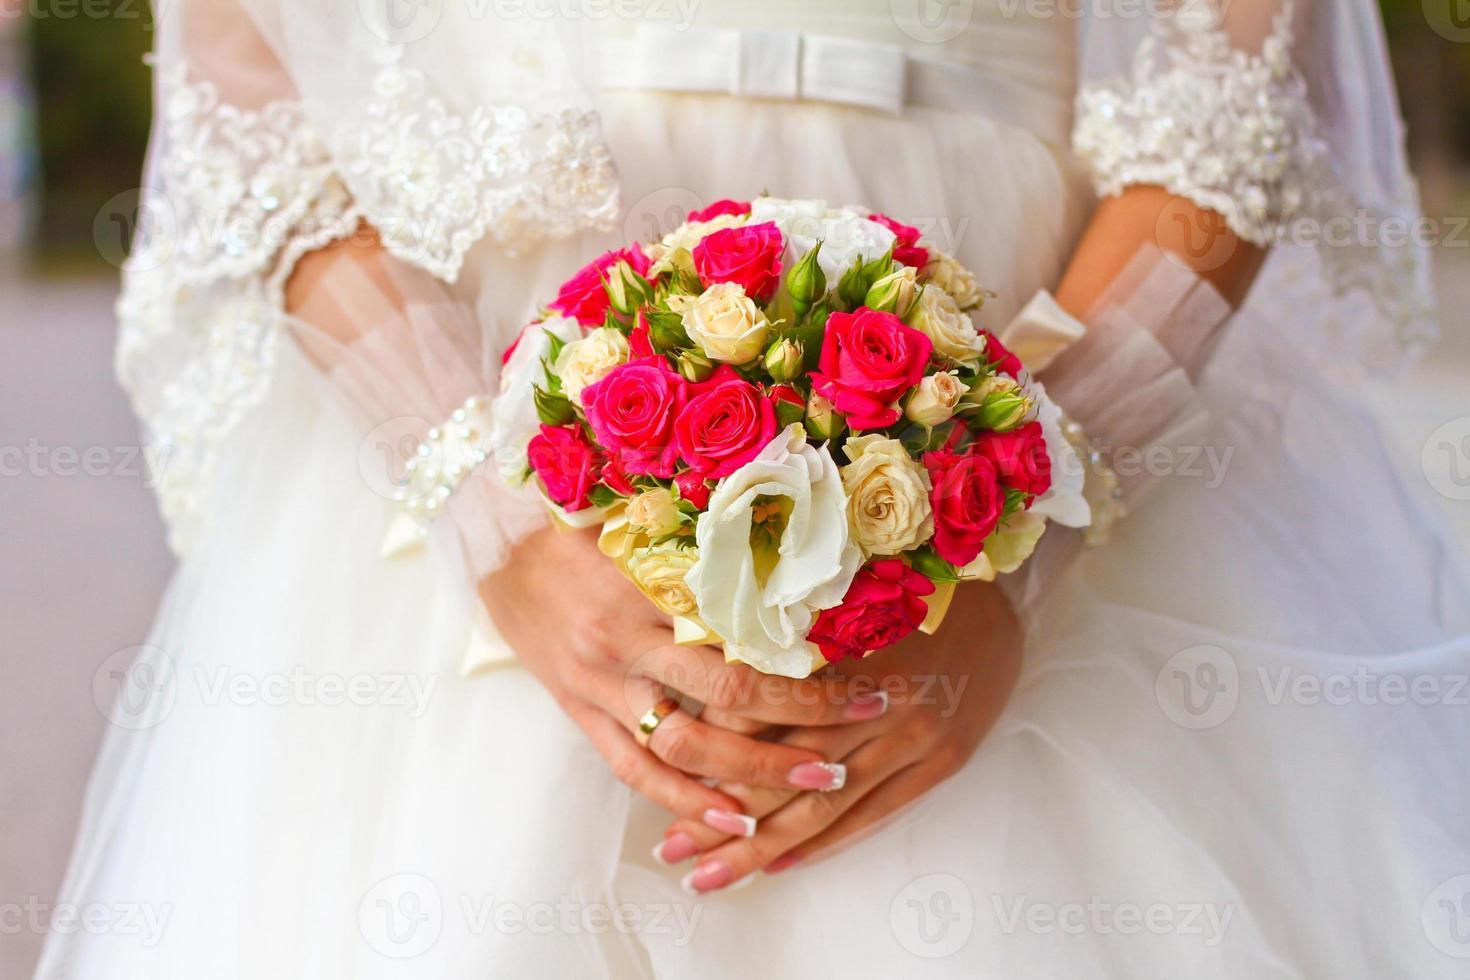 Bride holding wedding bouquet close up photo